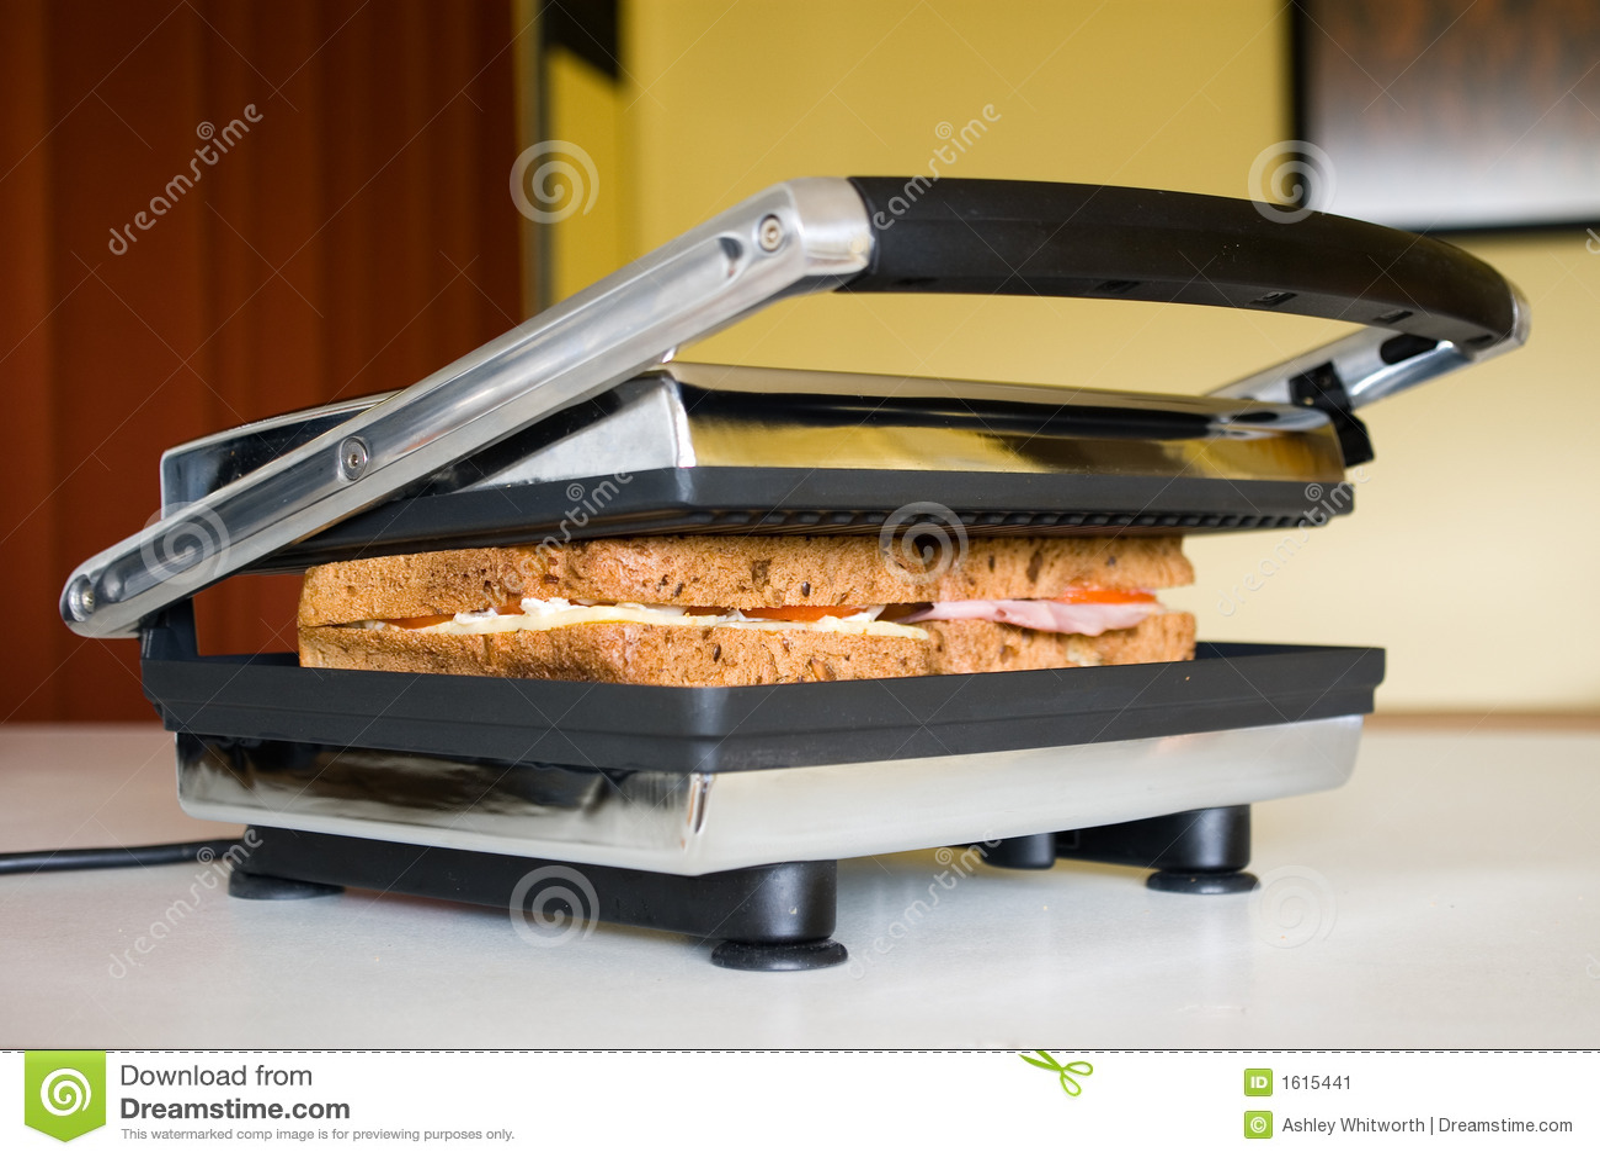 Sandwichpresse